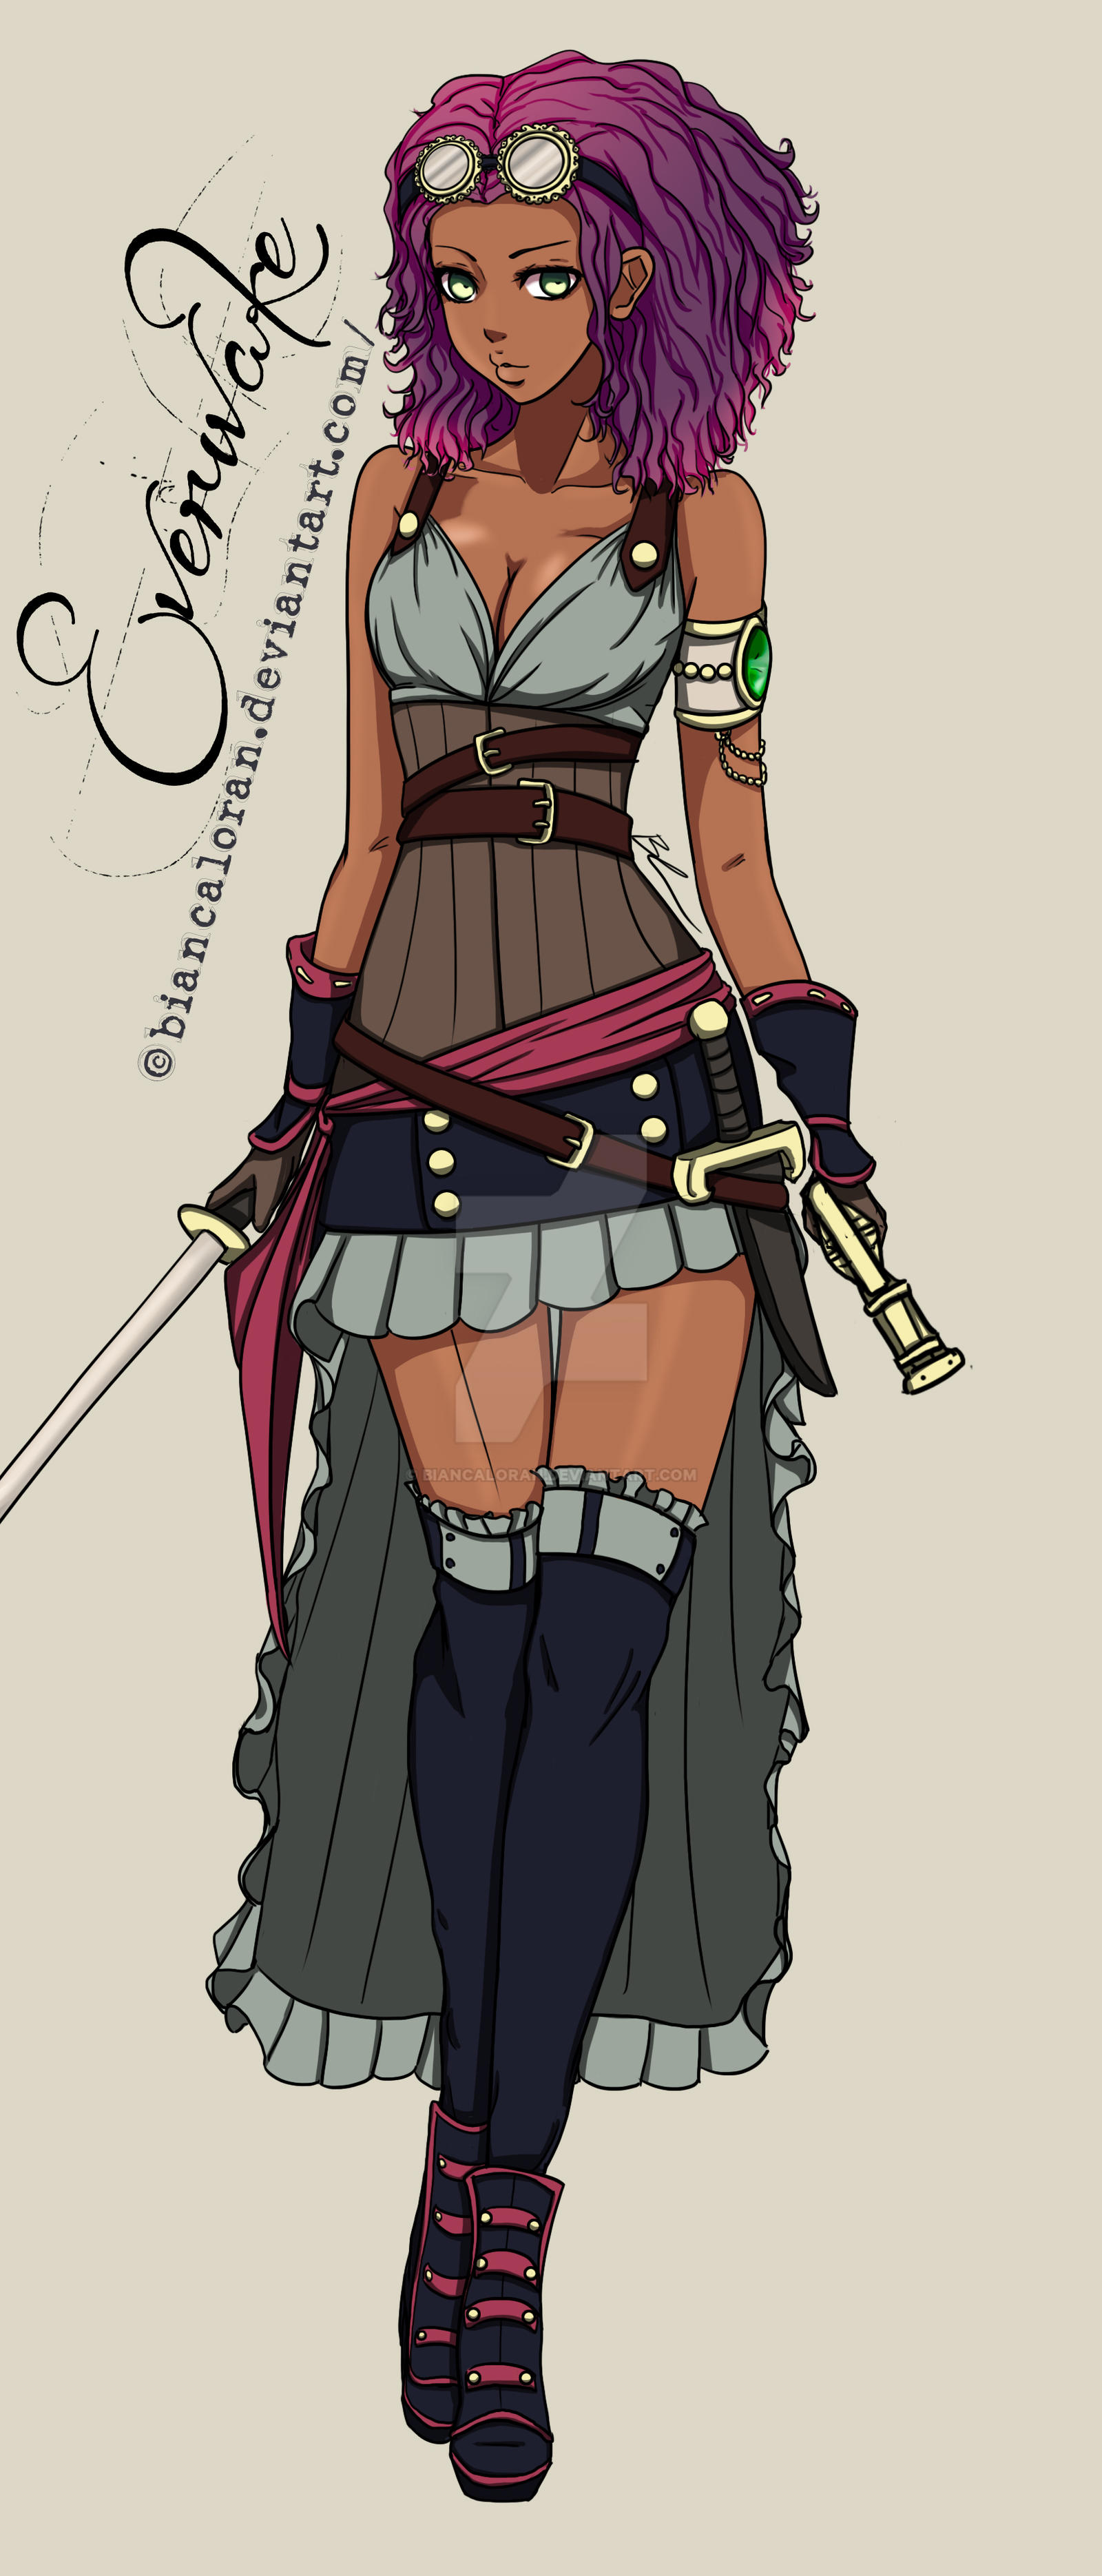 Princess Jade - Everwake Character by biancaloran